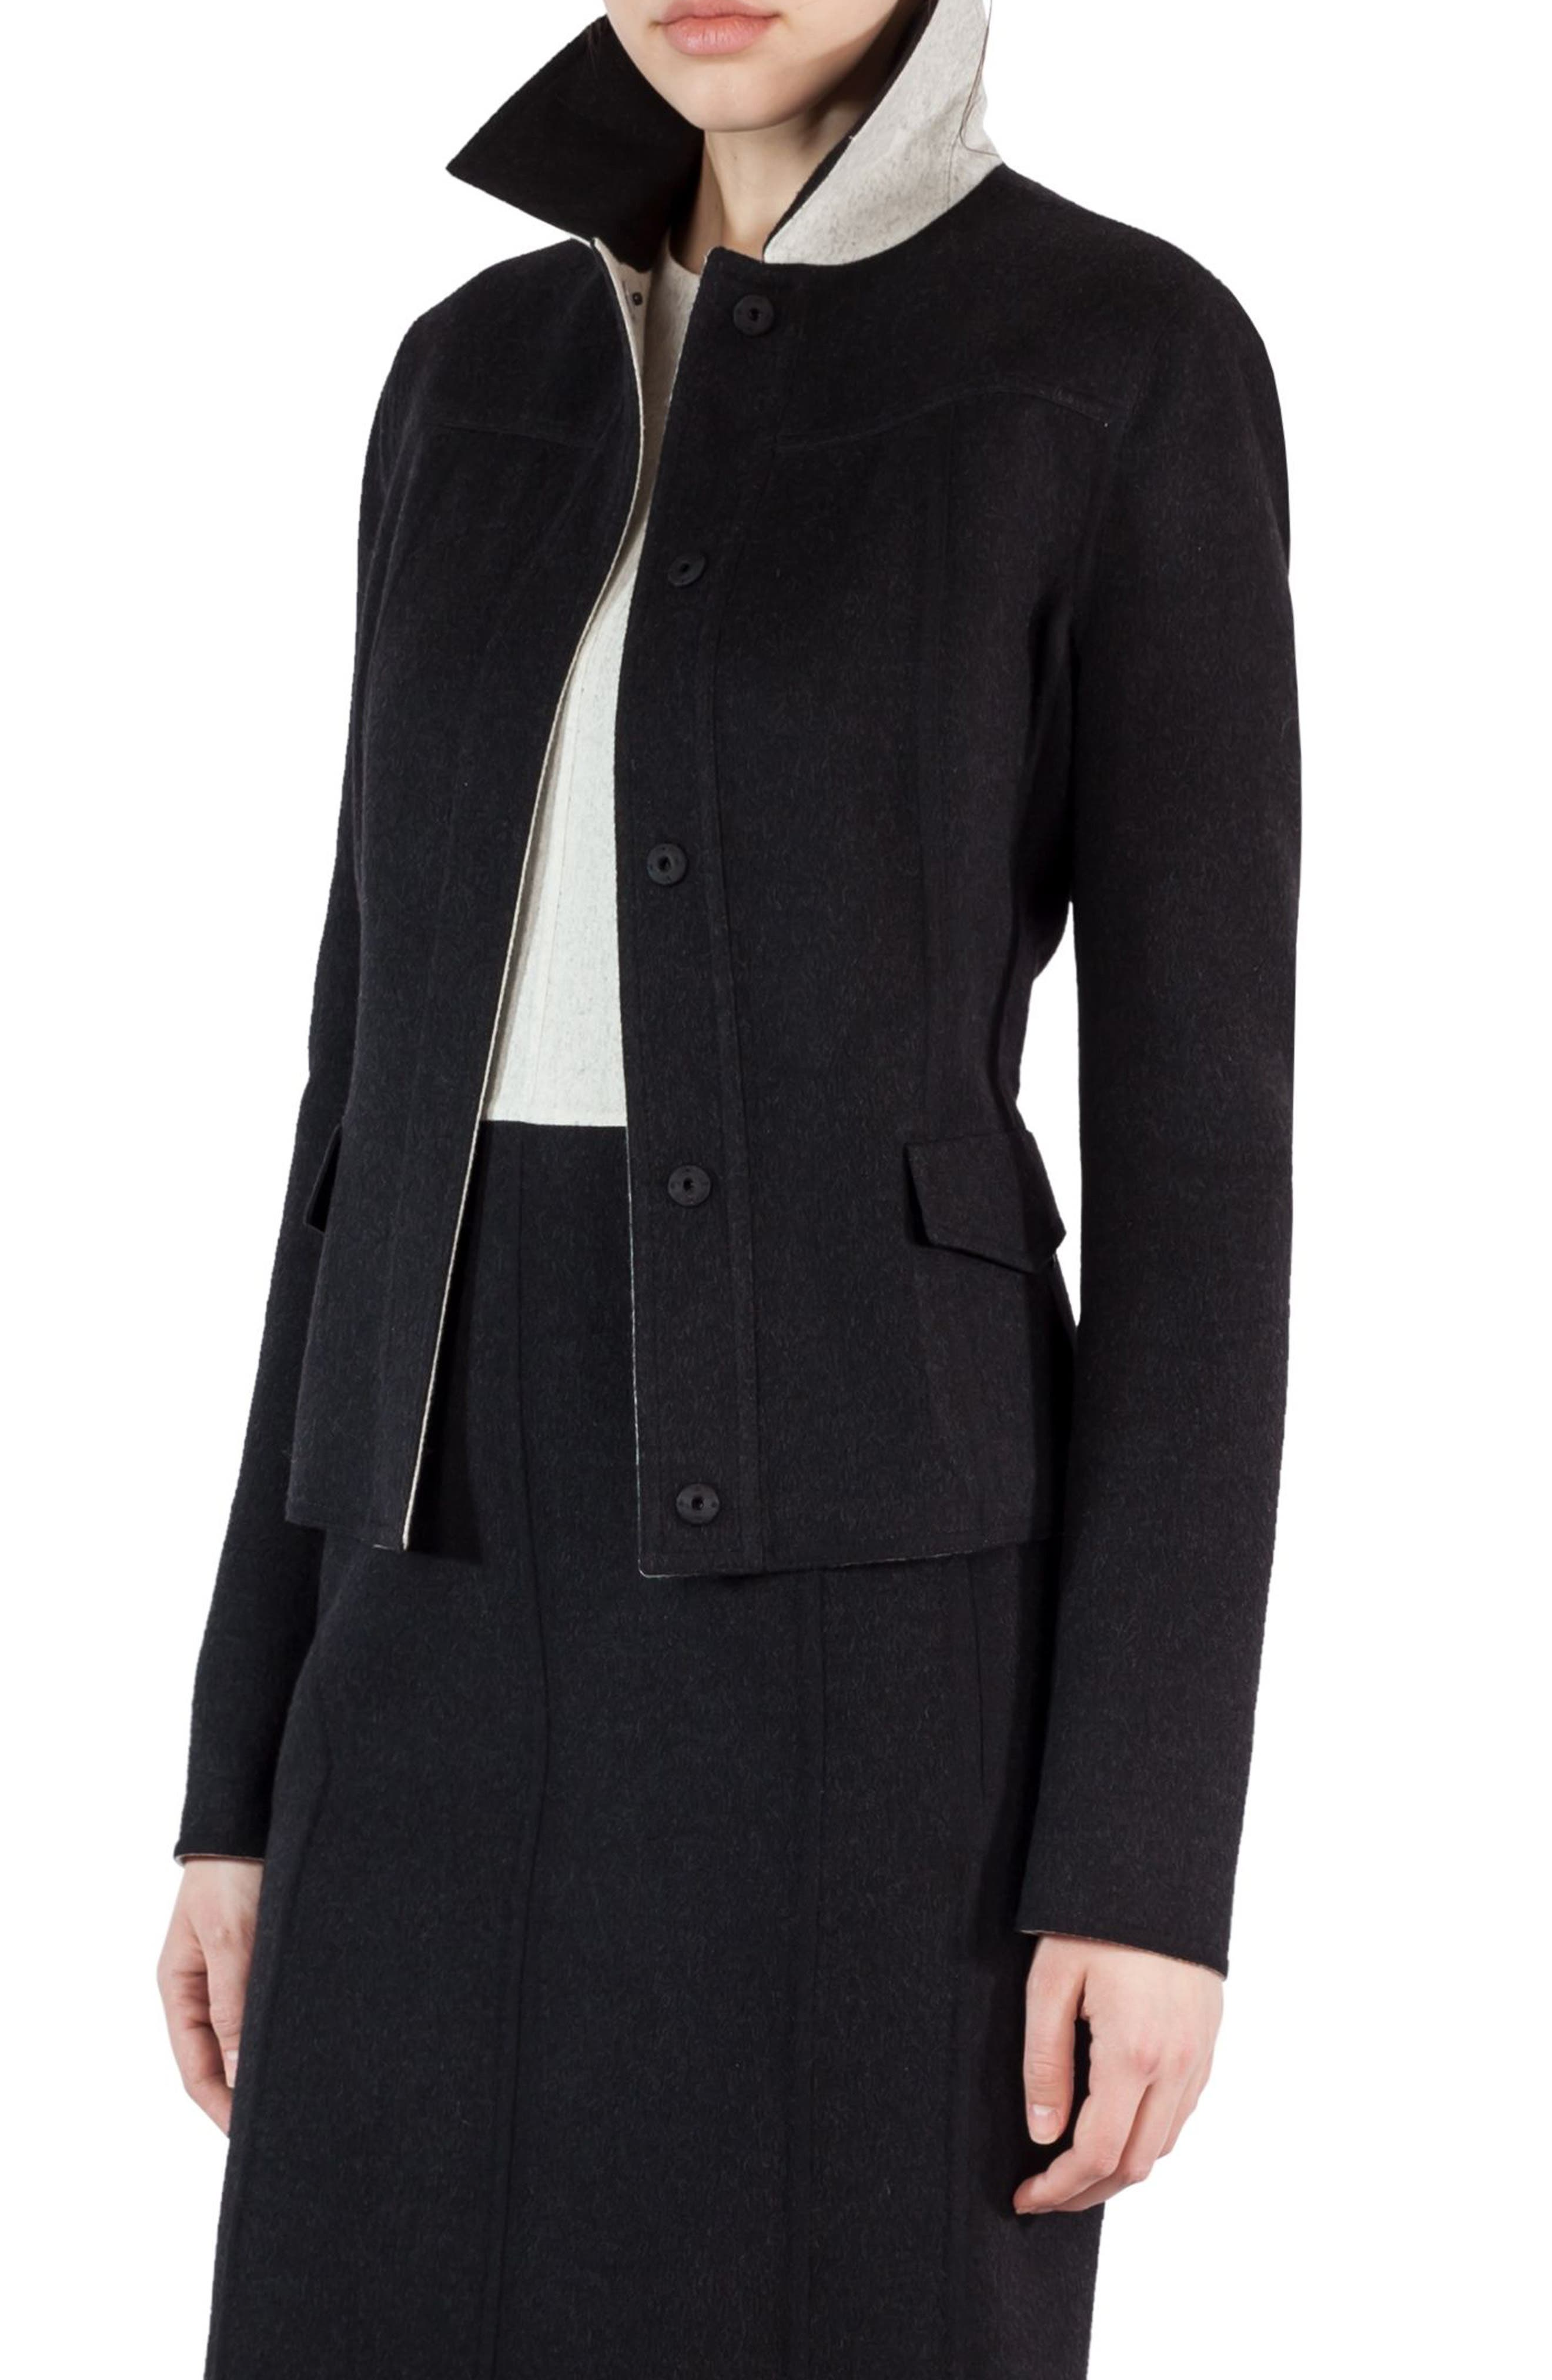 Alternate Image 1 Selected - Akris Double Face Wool Reversible Bicolor Jacket